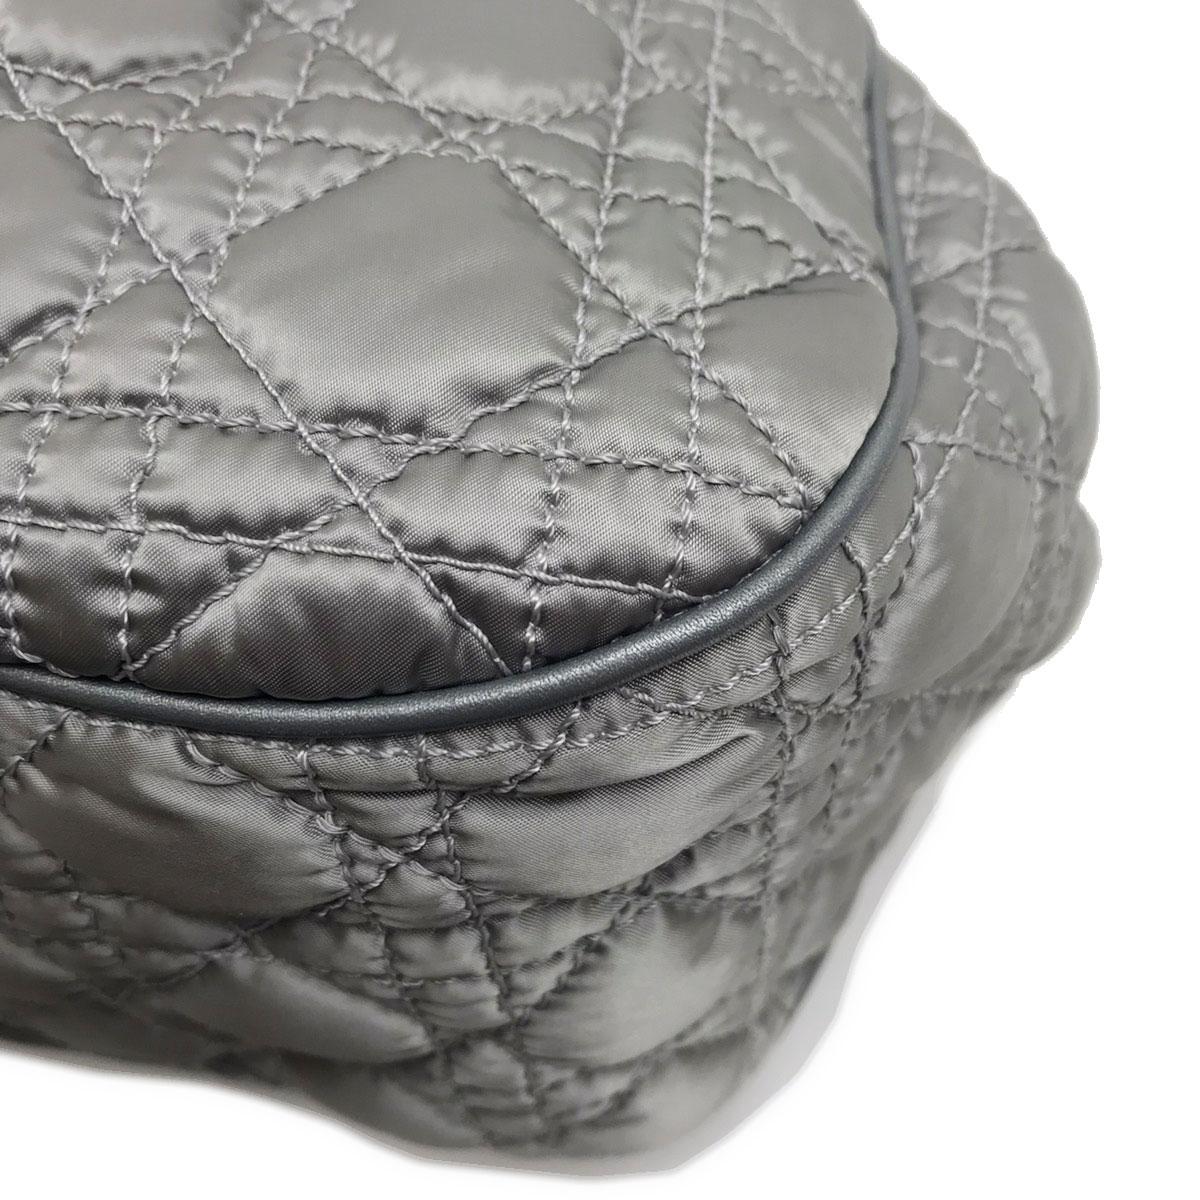 Christian Dior クリスチャンディオール カナージュ ハンドバッグ ナイロン レザー シルバー